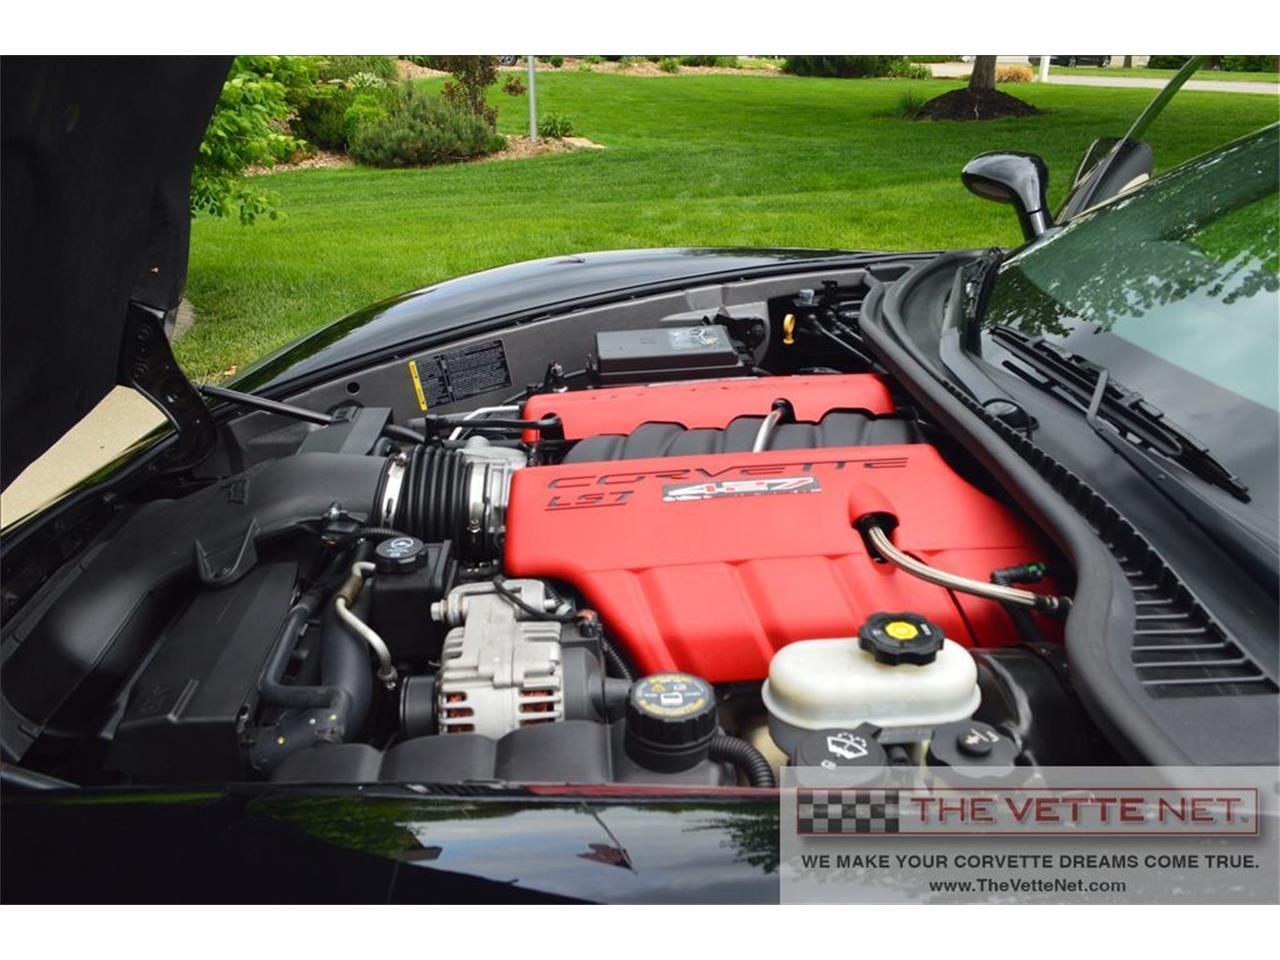 2009 Chevrolet Corvette (CC-1091750) for sale in Sarasota, Florida